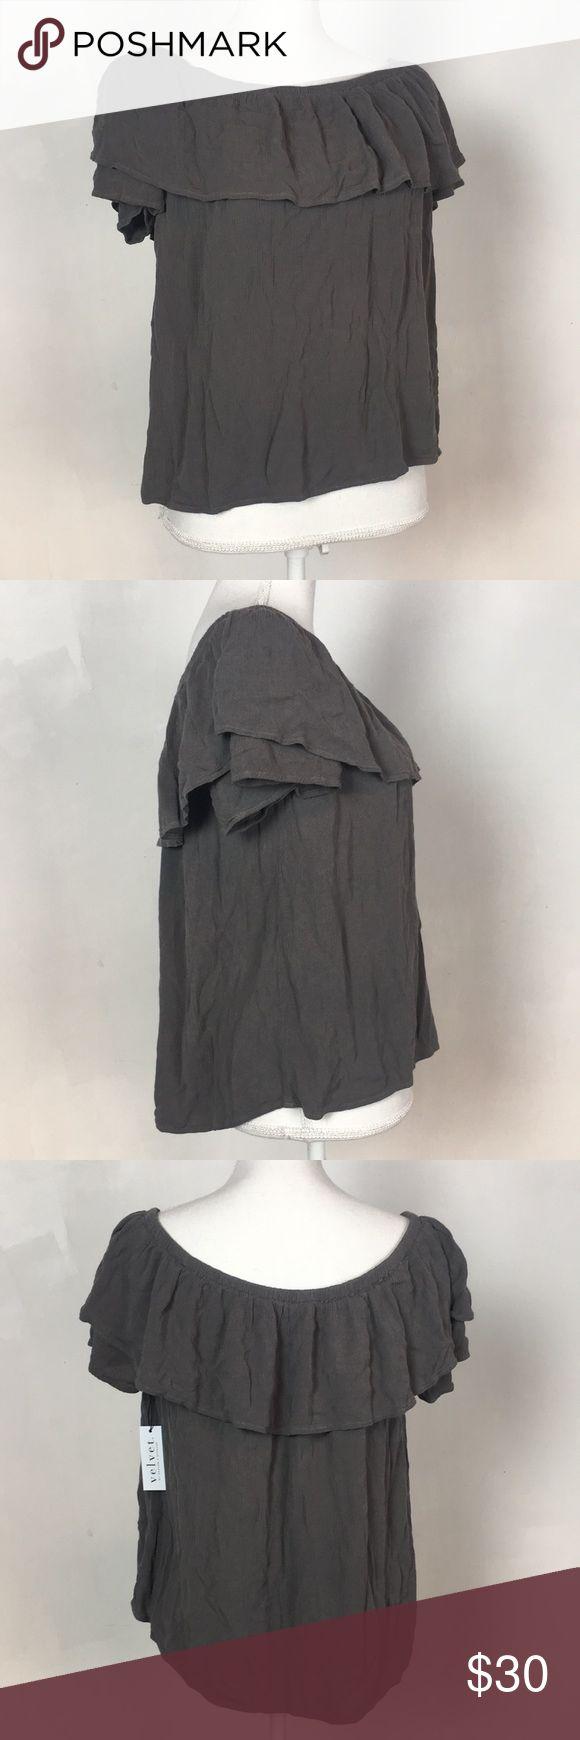 Grey puckered blouse Brand new grey puckered elastic blouse by Velvet. 100% viscose fine fabric. Size M Velvet by Graham & Spencer Tops Blouses